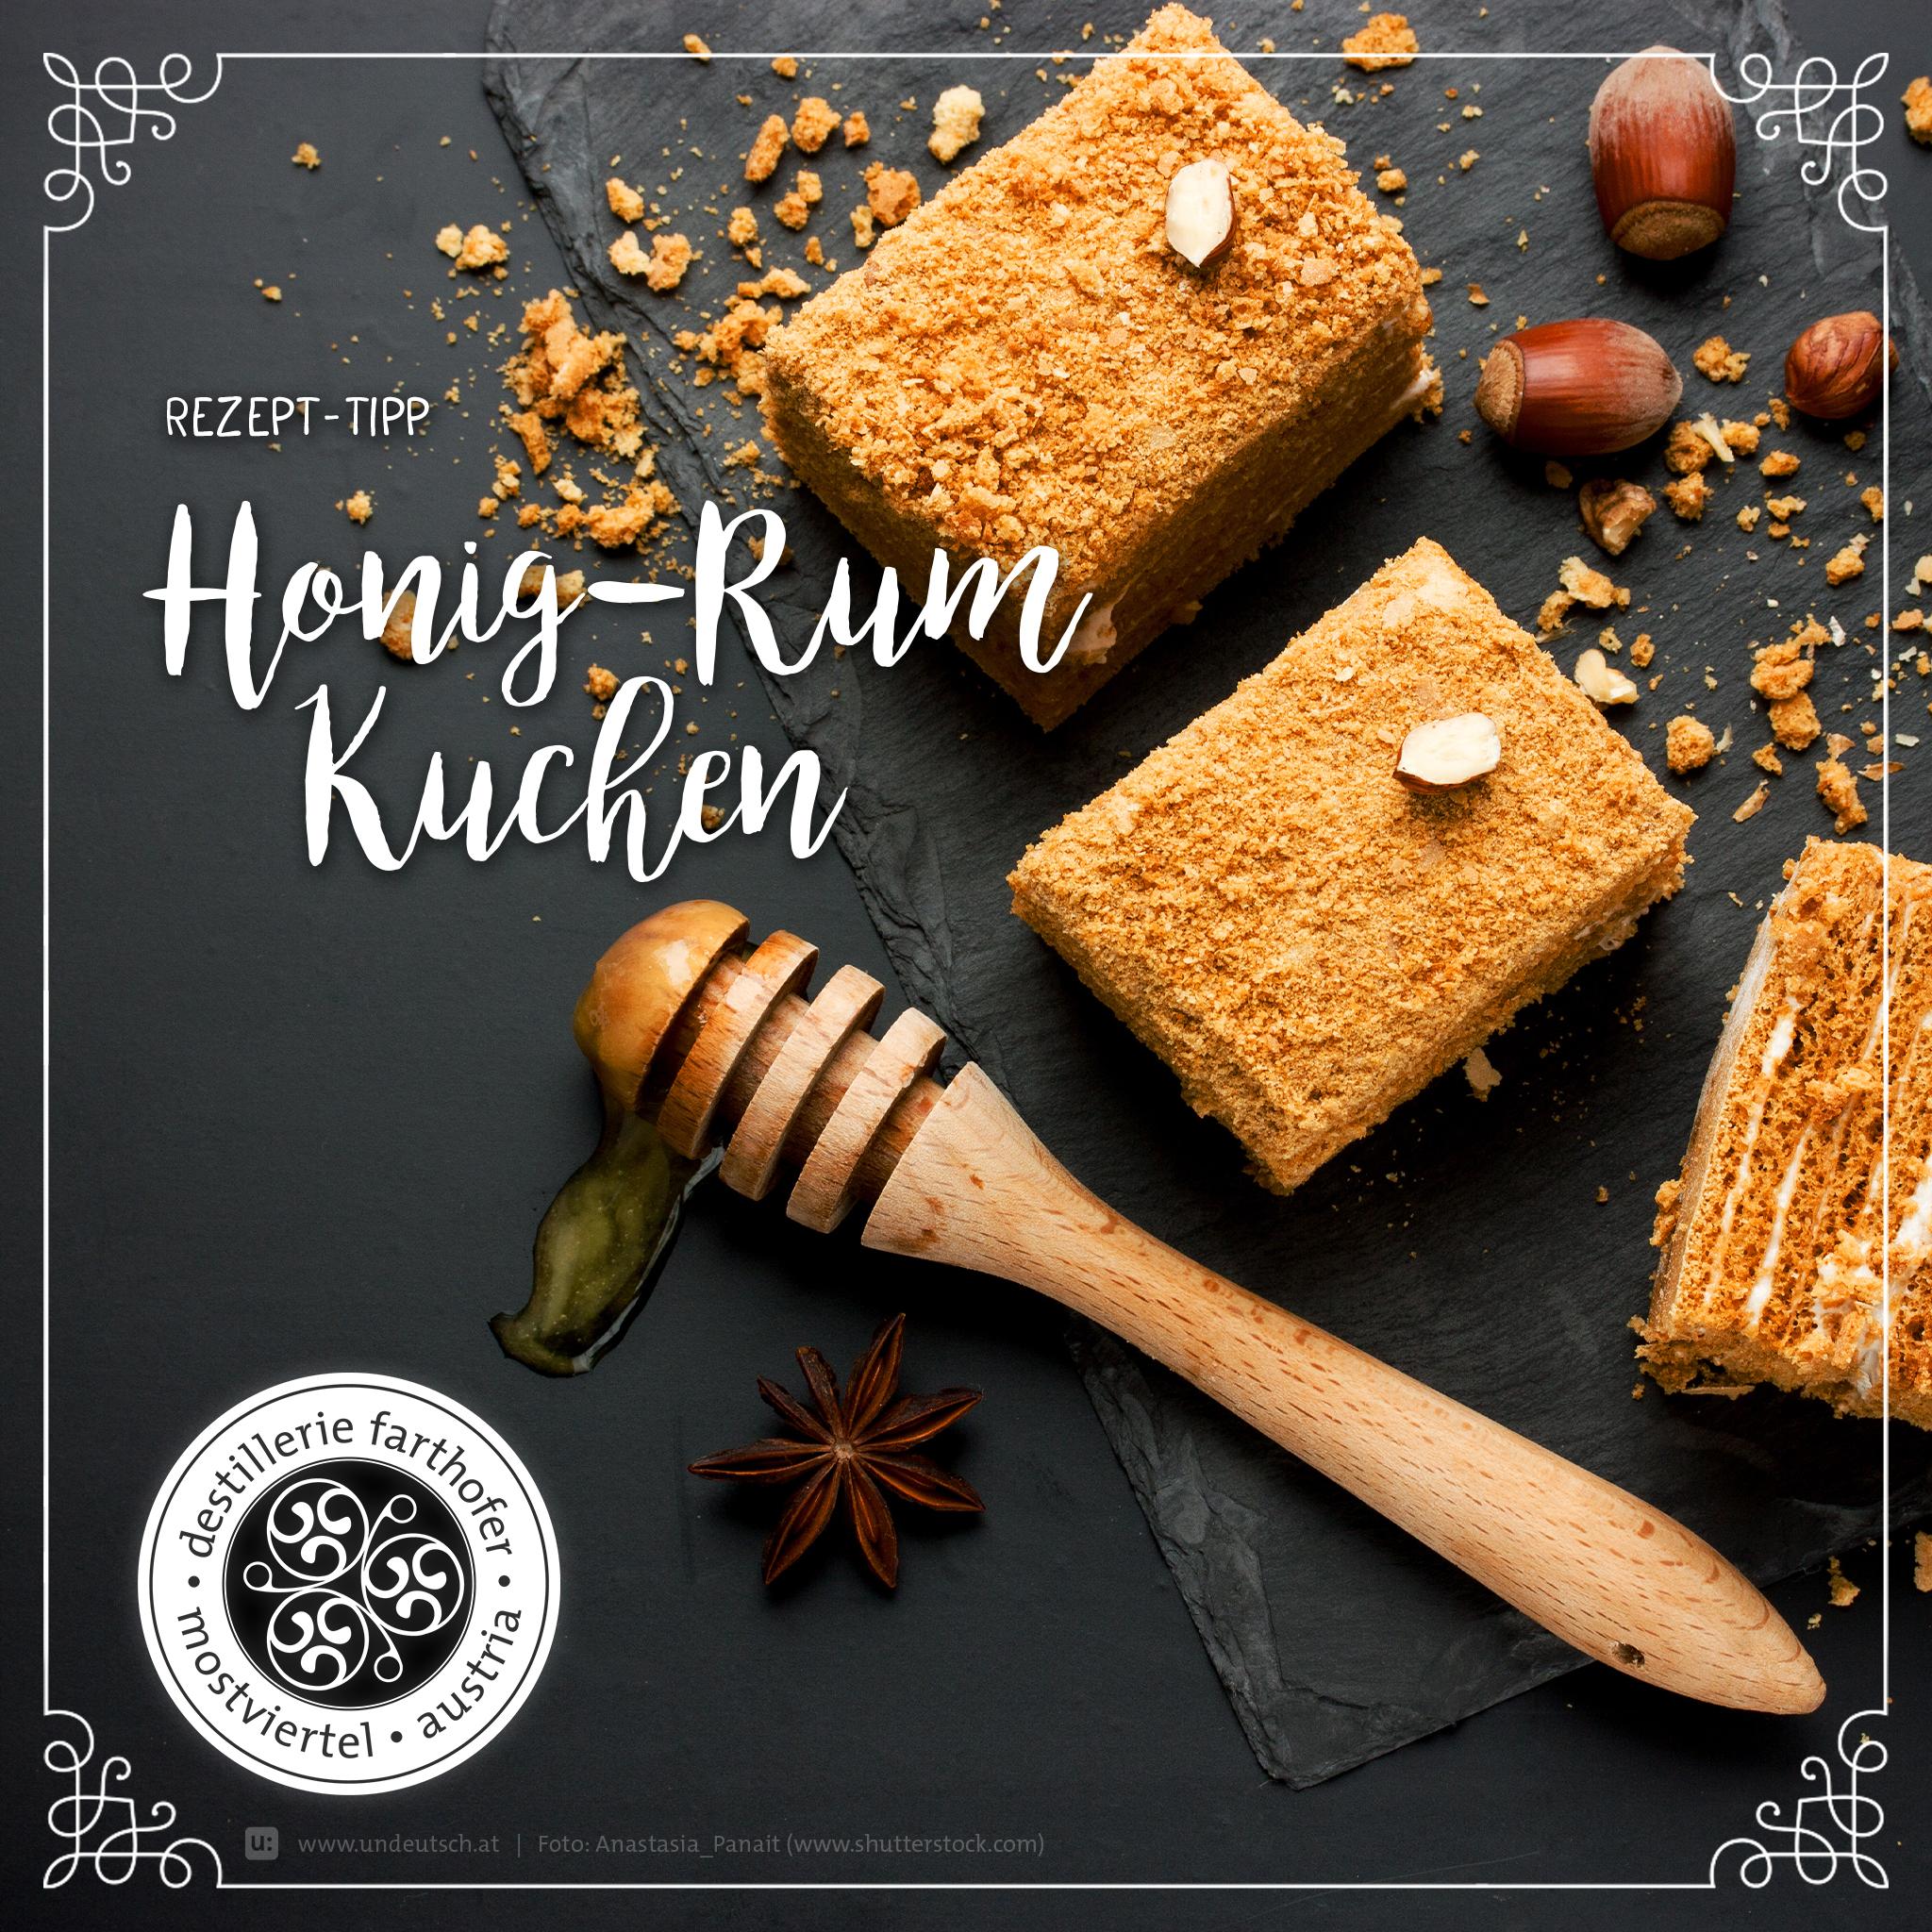 Rezept - Dessert - Honig-Rum-Kuchen - Destillerie Farthofer